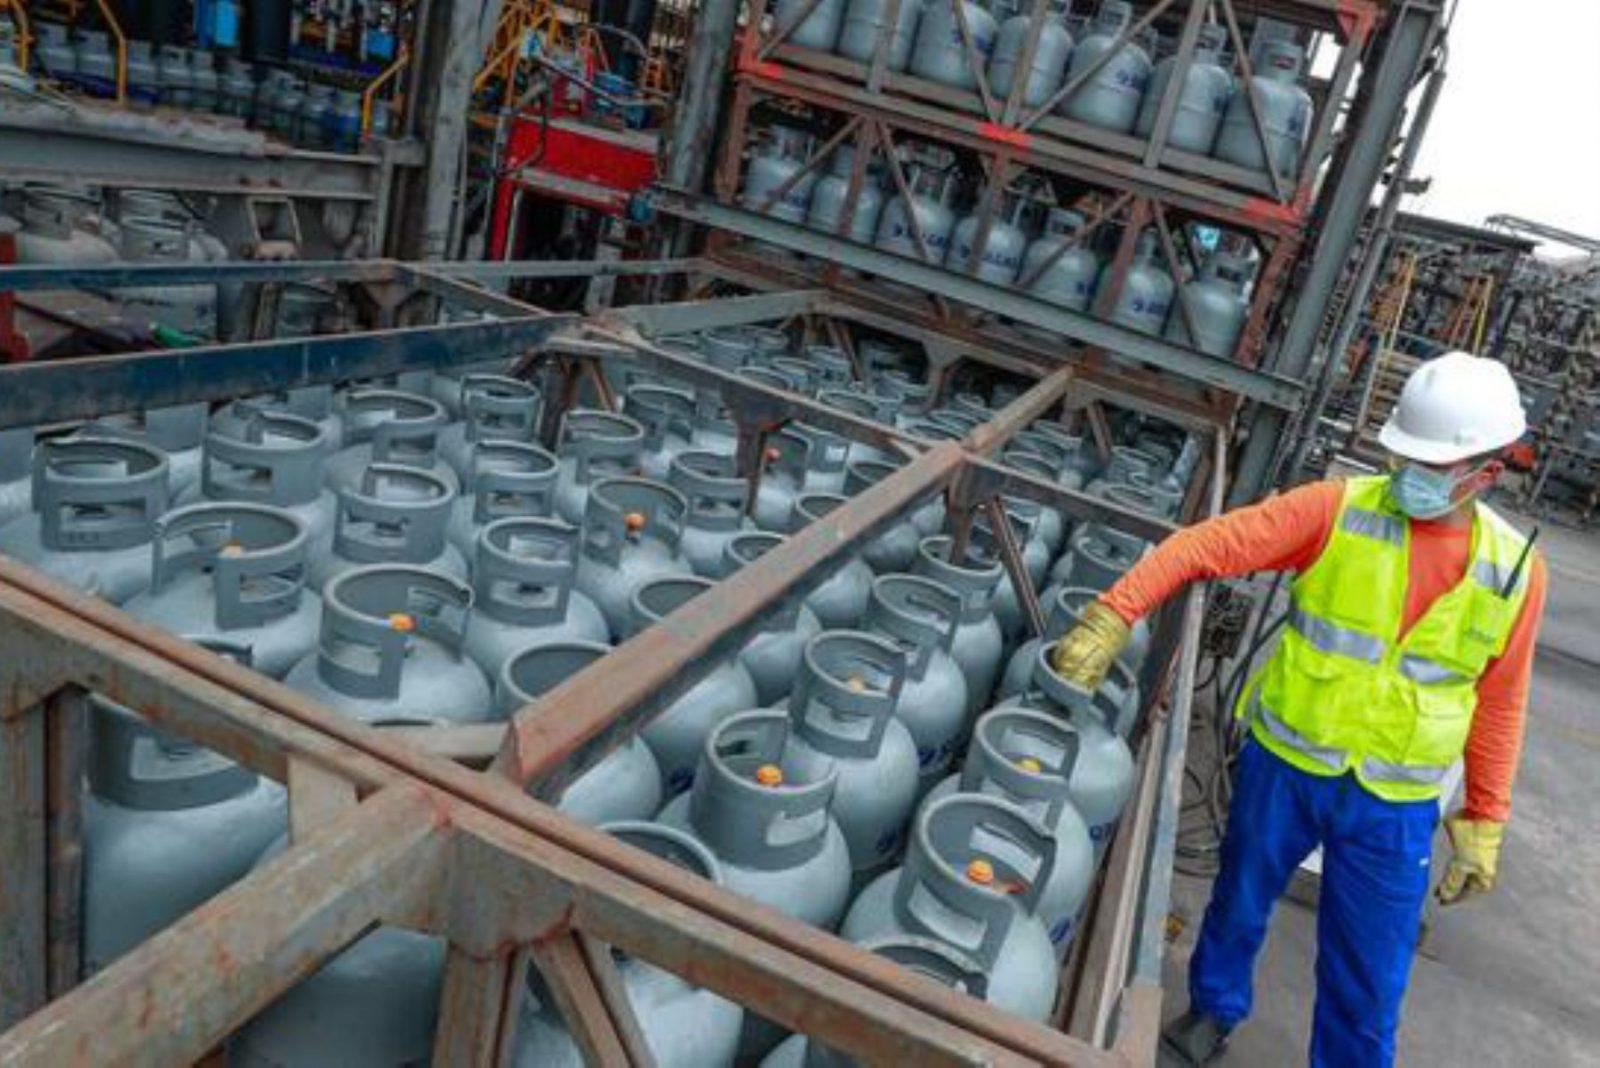 Bono de energía: Se ampliará cobertura para mayor acceso a balón de gas